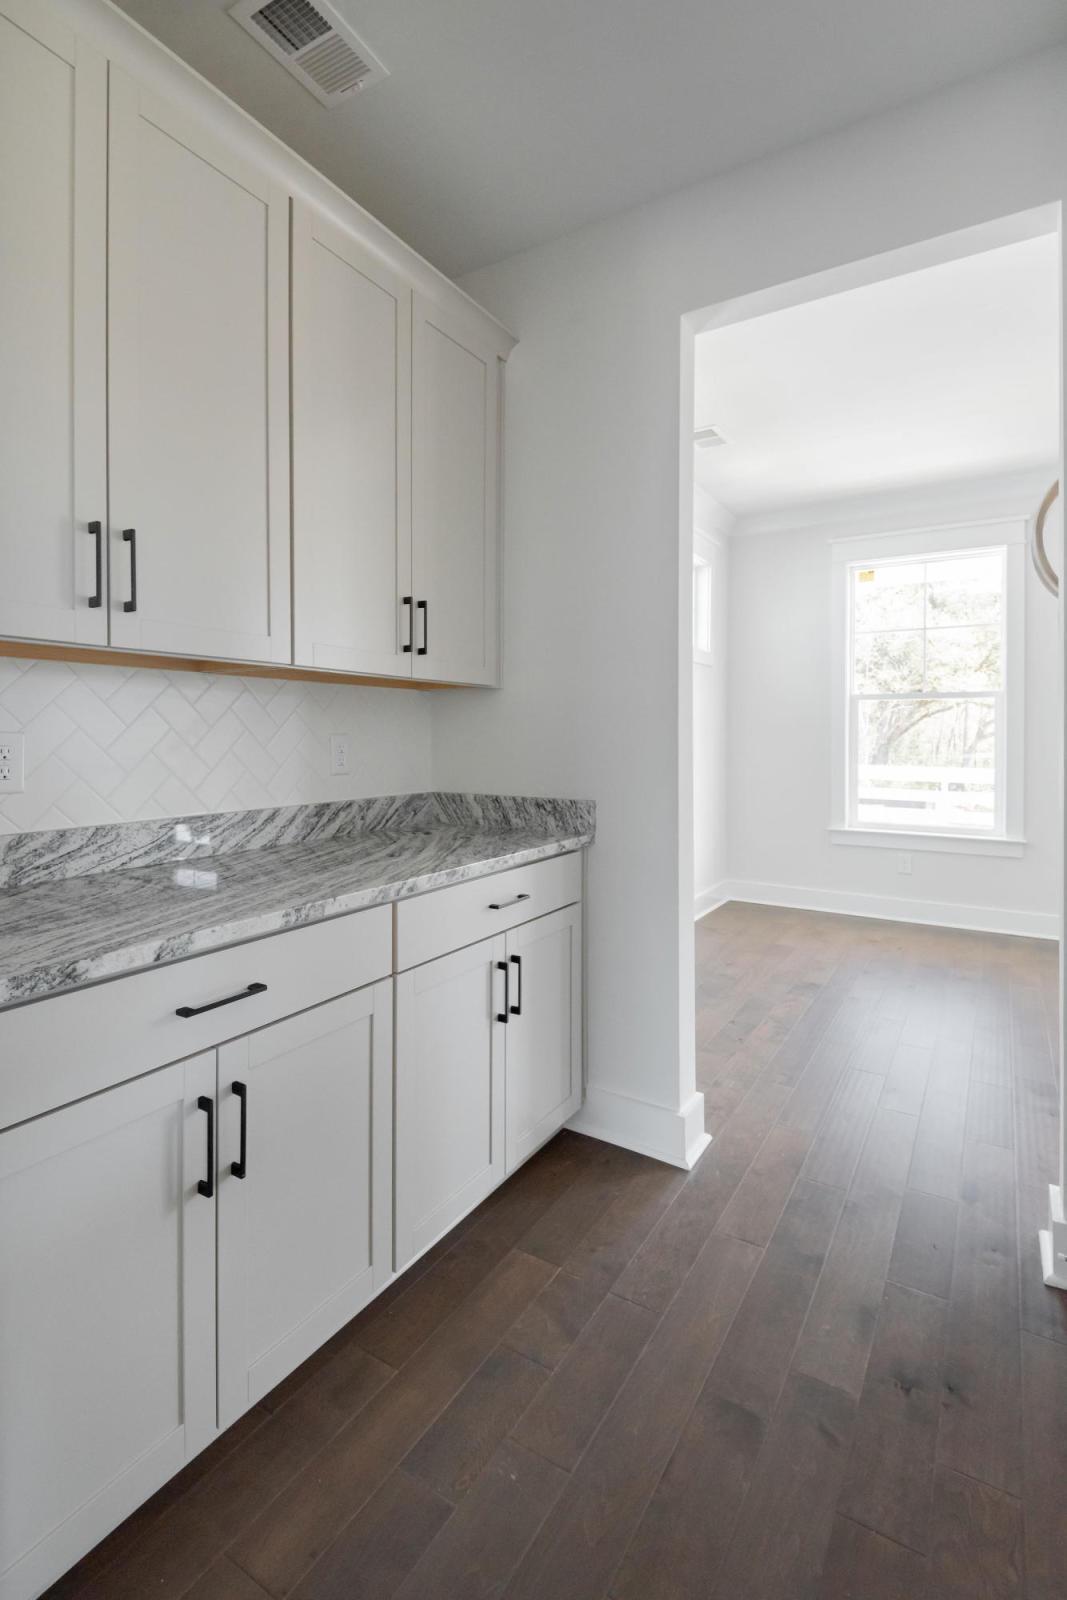 James Island Homes For Sale - 1397 Harbor View, Charleston, SC - 14